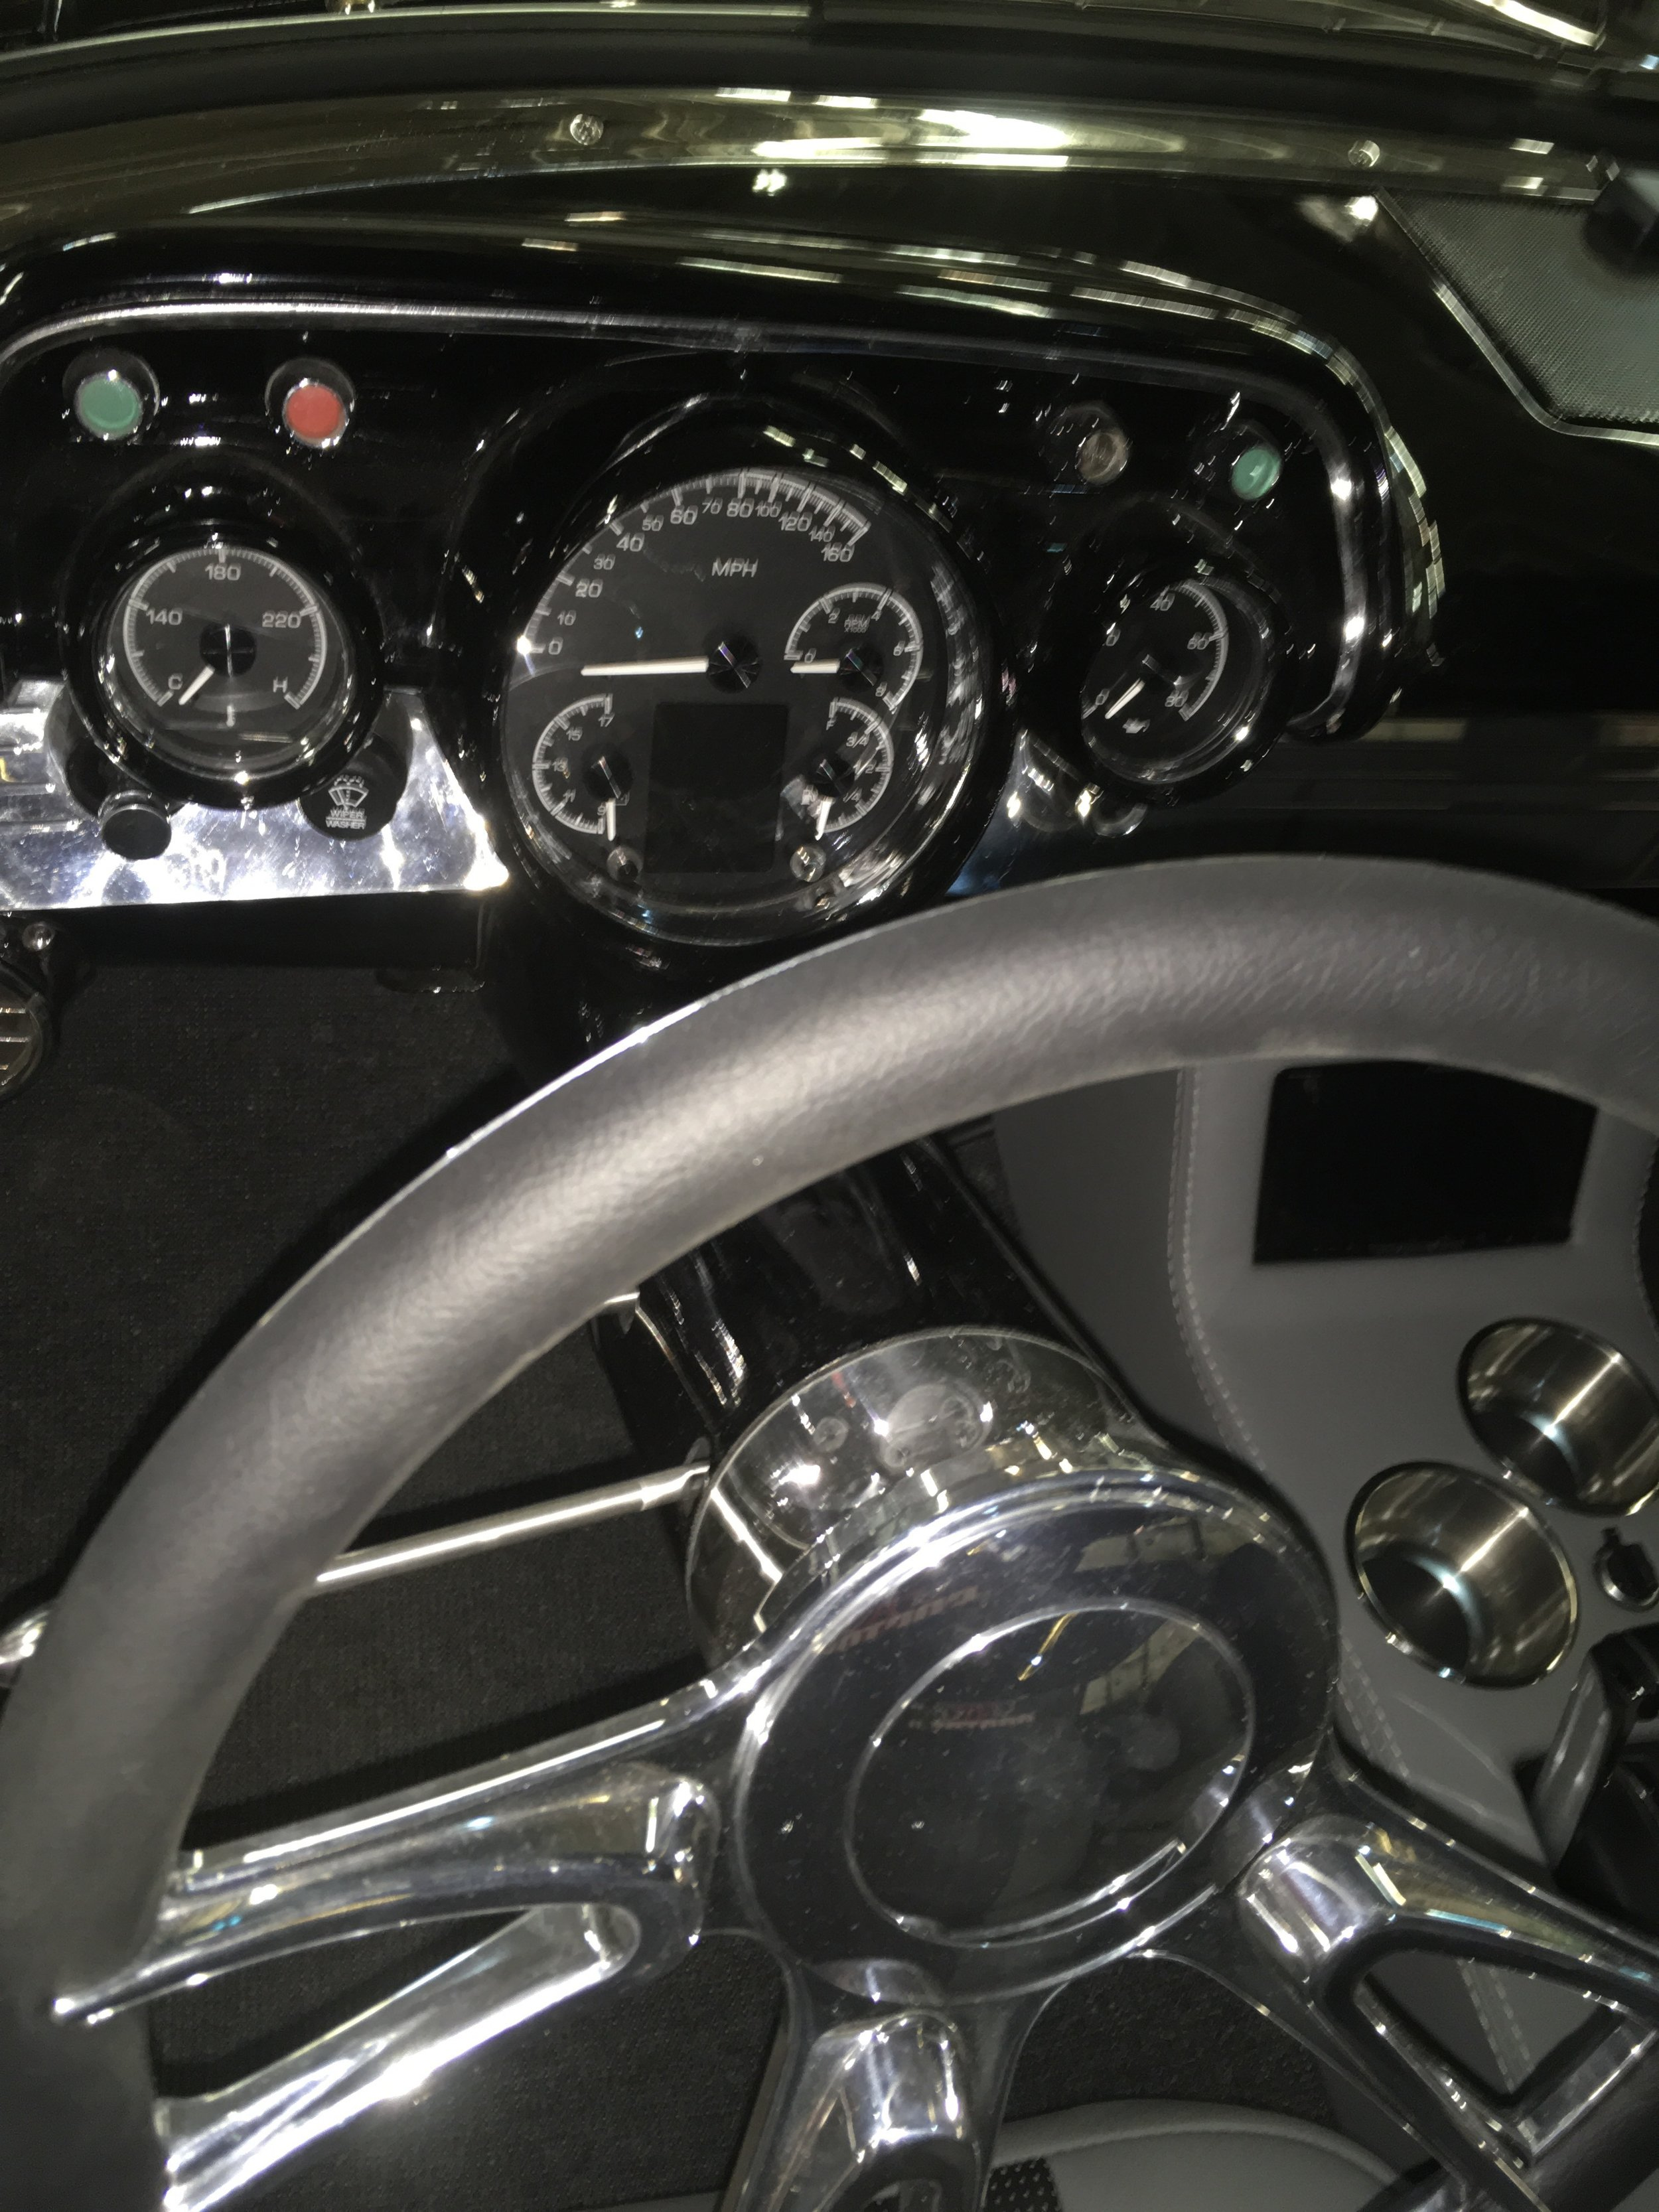 1957-Nomad-dashboard-minneapolis-hot-rod-restoration-hot-rod-factory.jpg